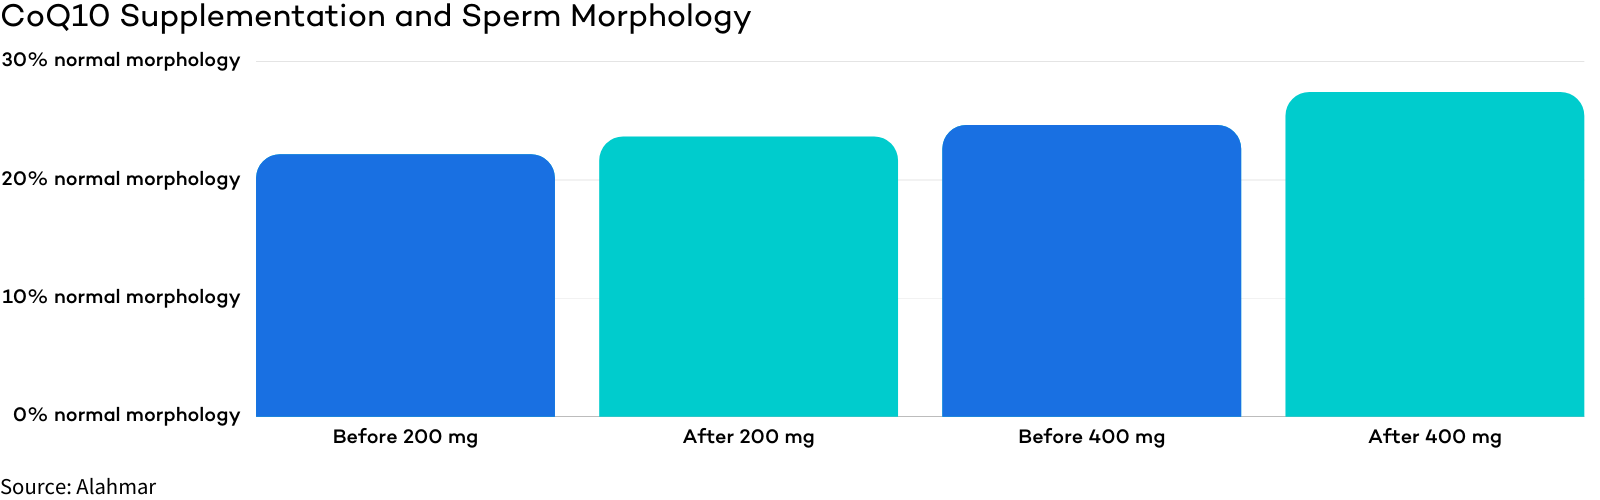 CoQ10 - Fertility Supplement for Men - Sperm Morphology